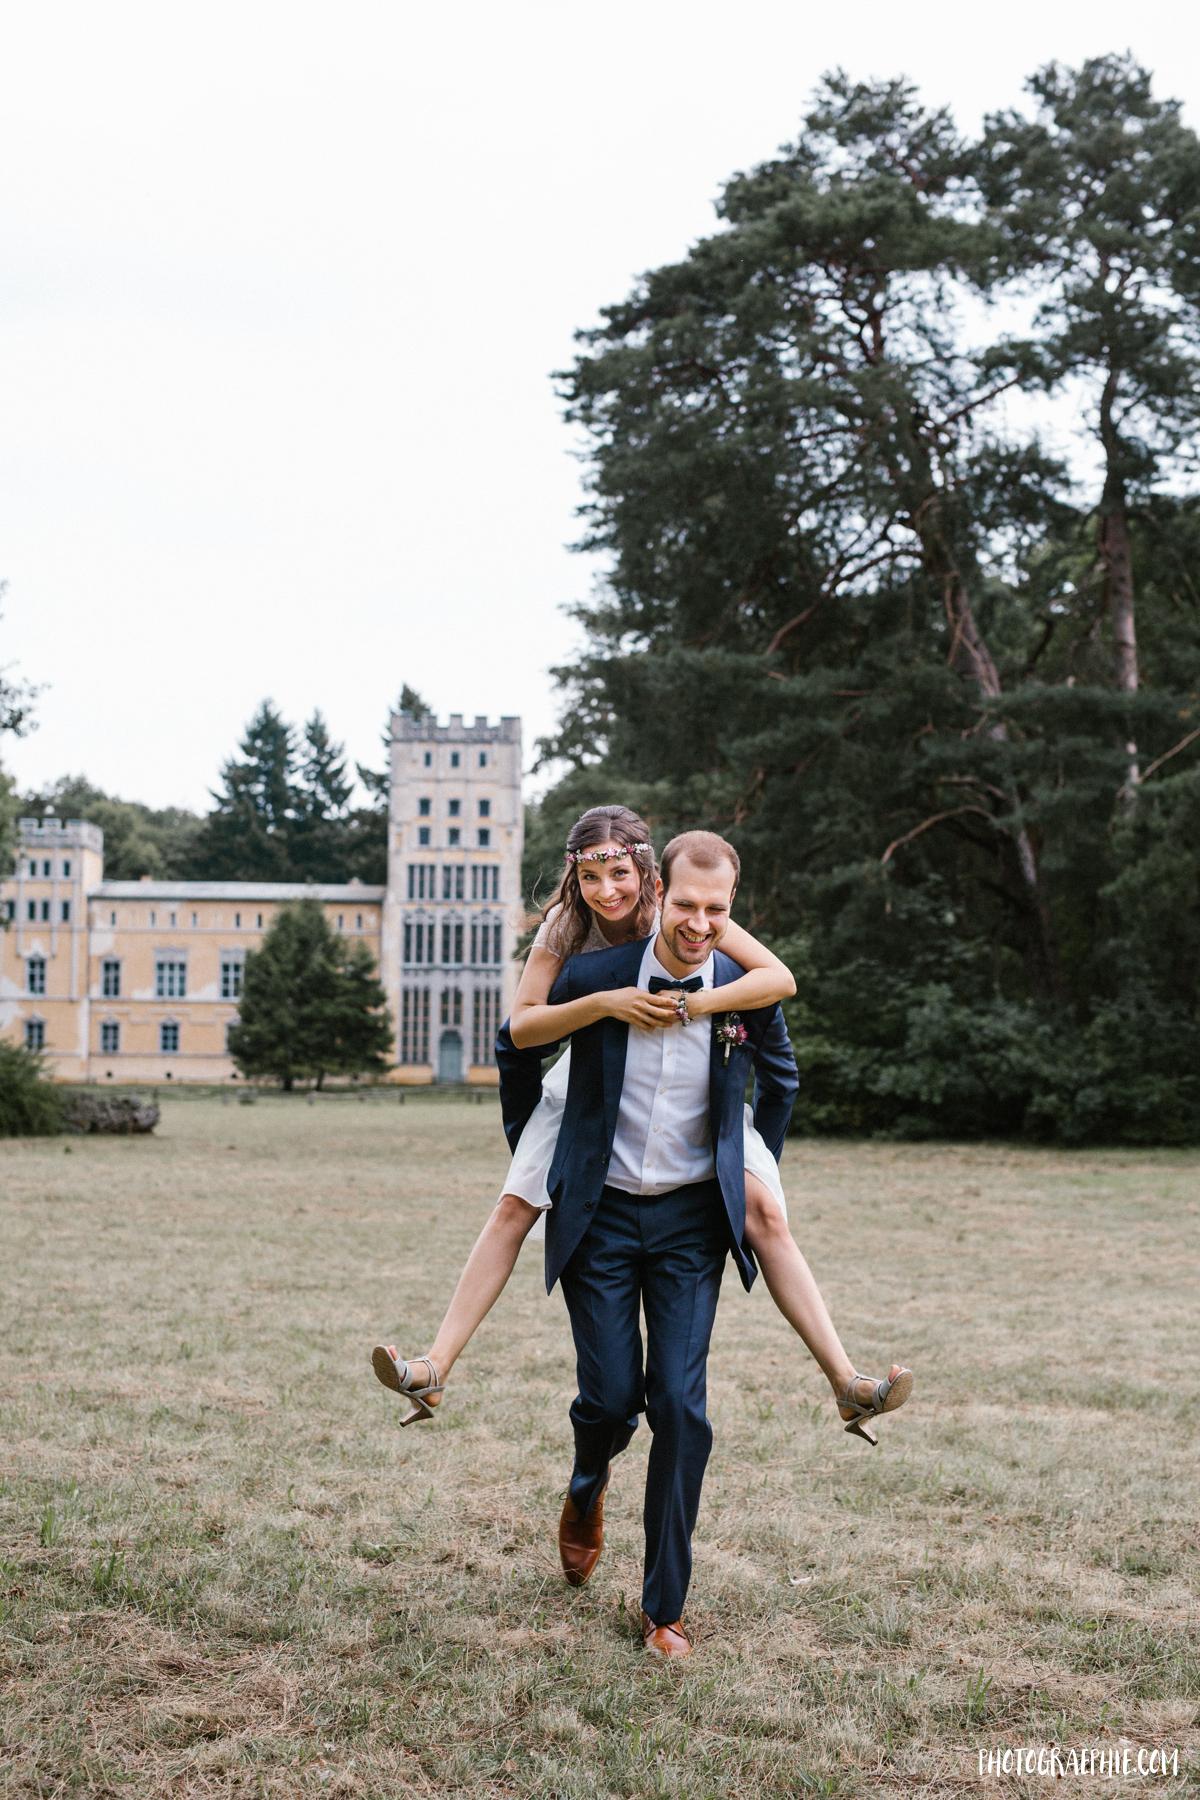 Rae Tashman Wedding Photography - photograephie.com